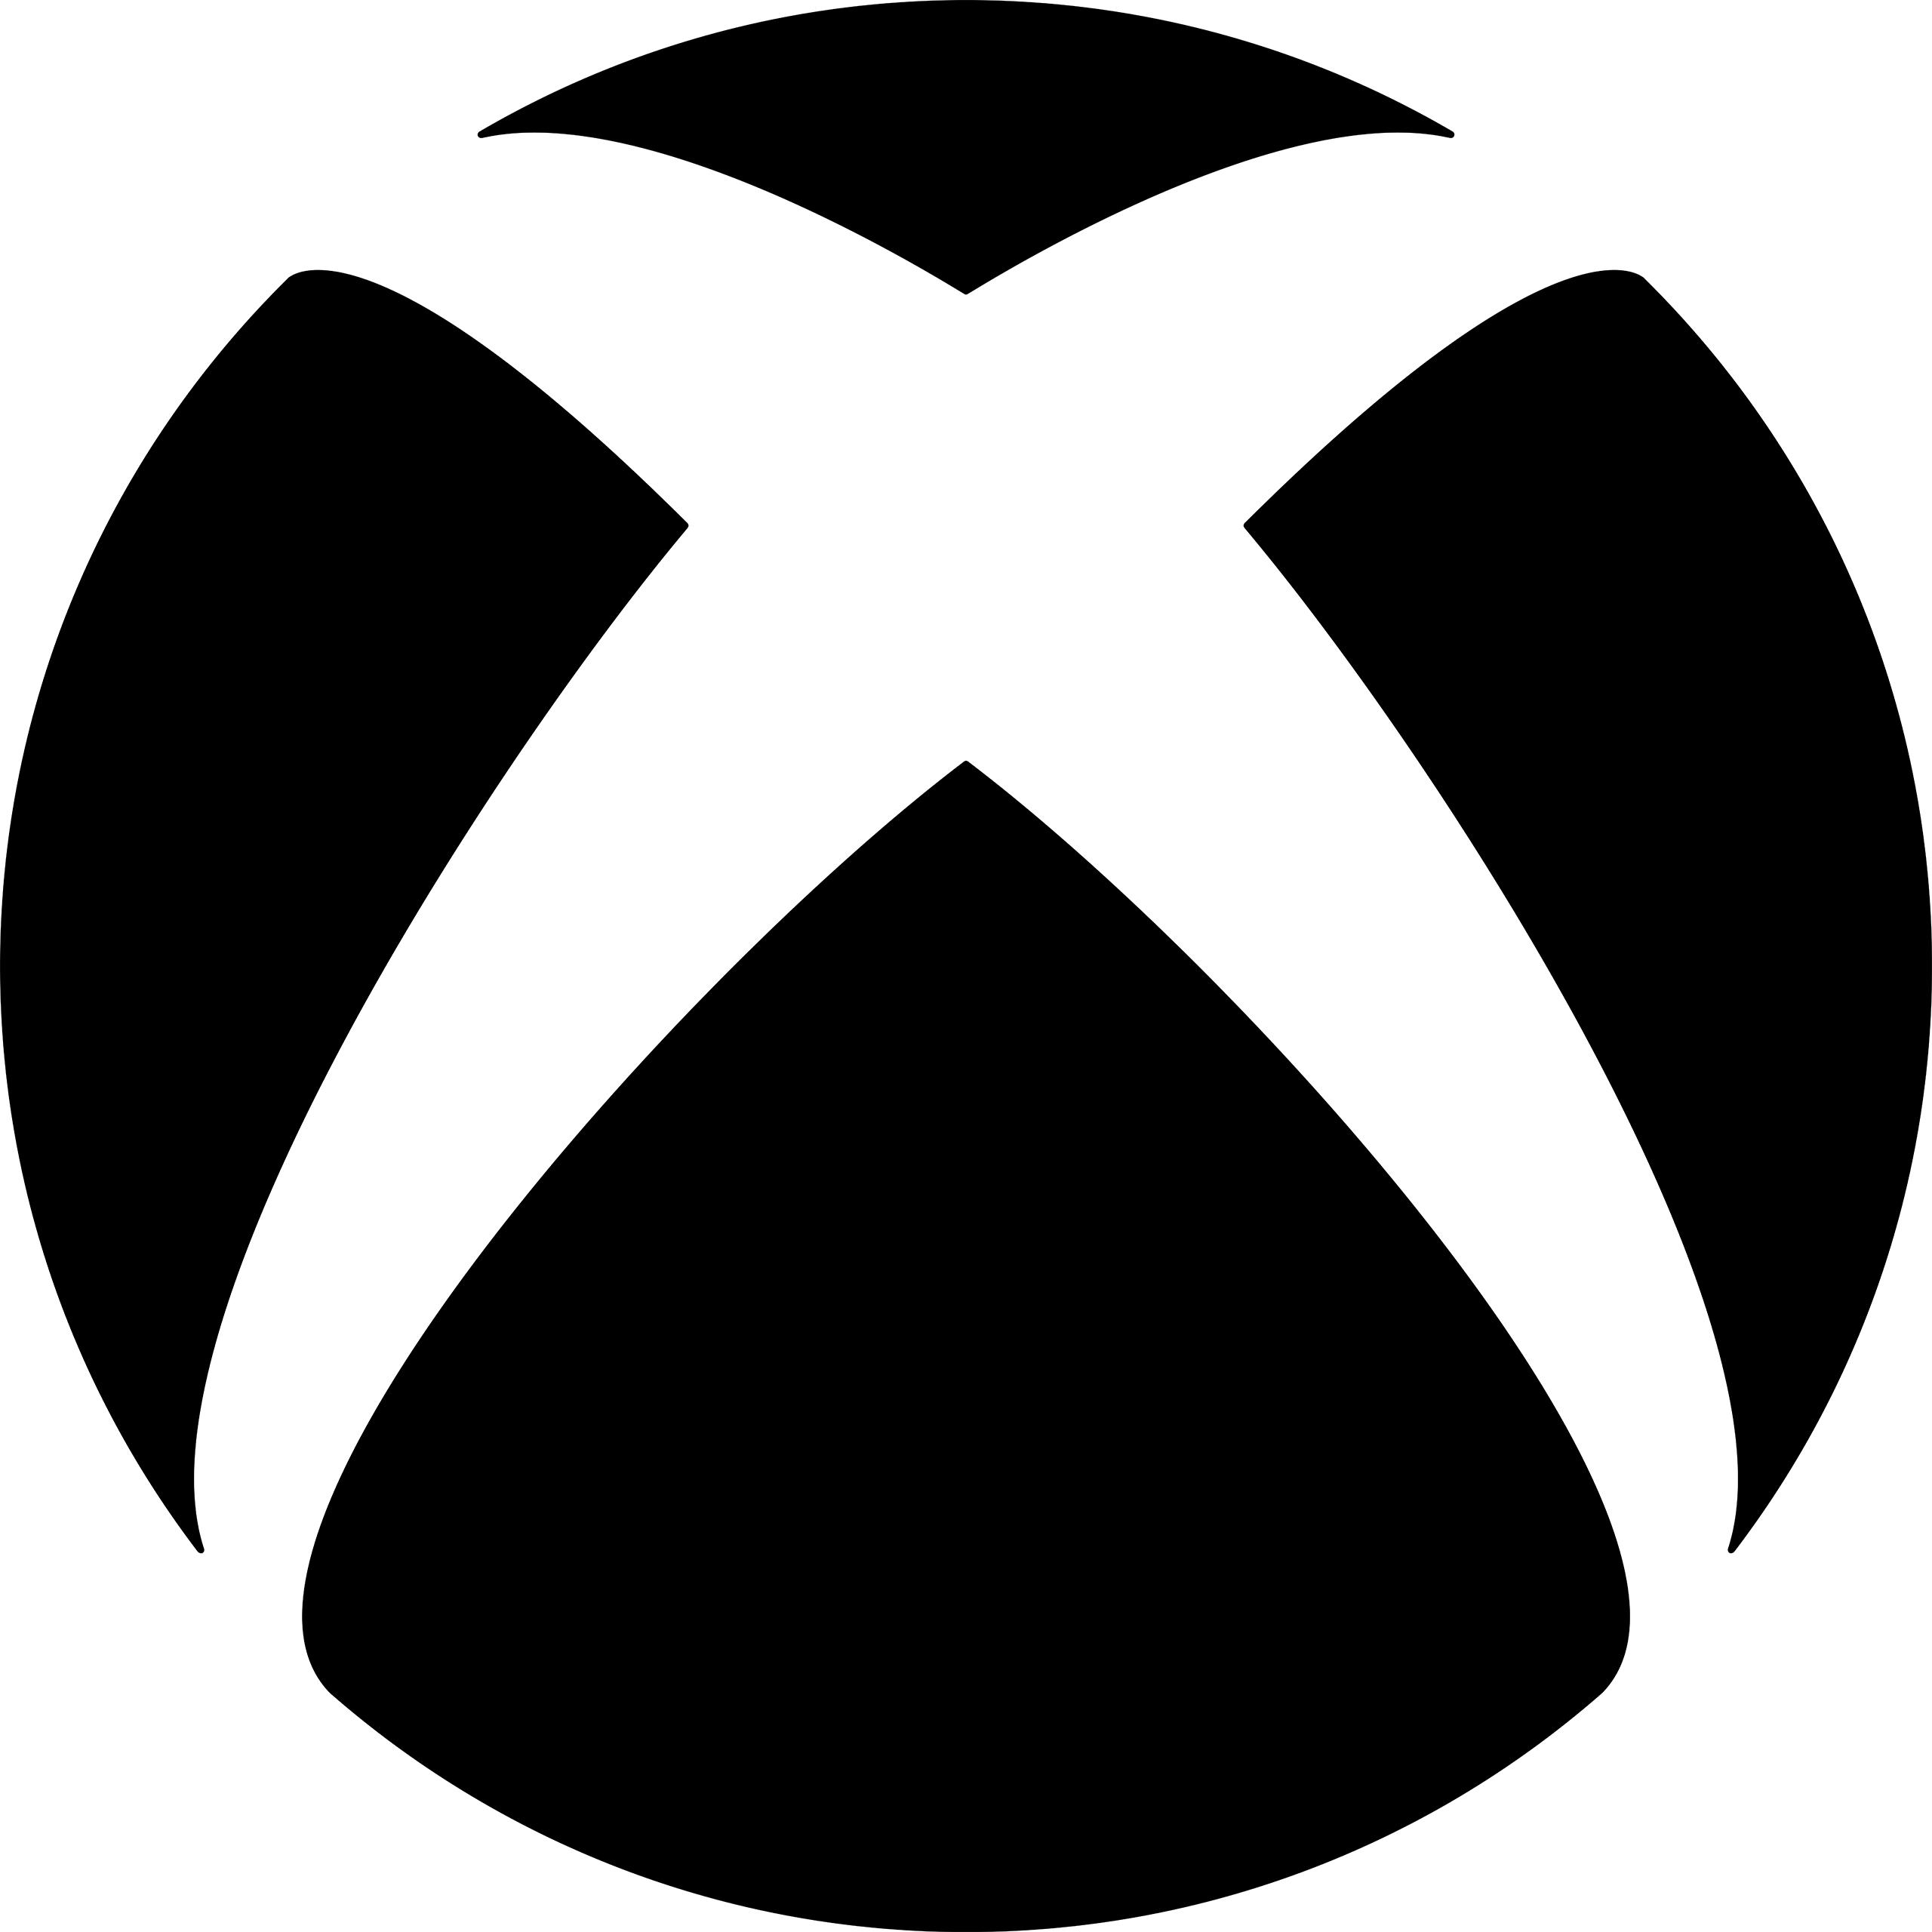 xbox games logo symbol | Xbox logo, Xbox, Video games xbox